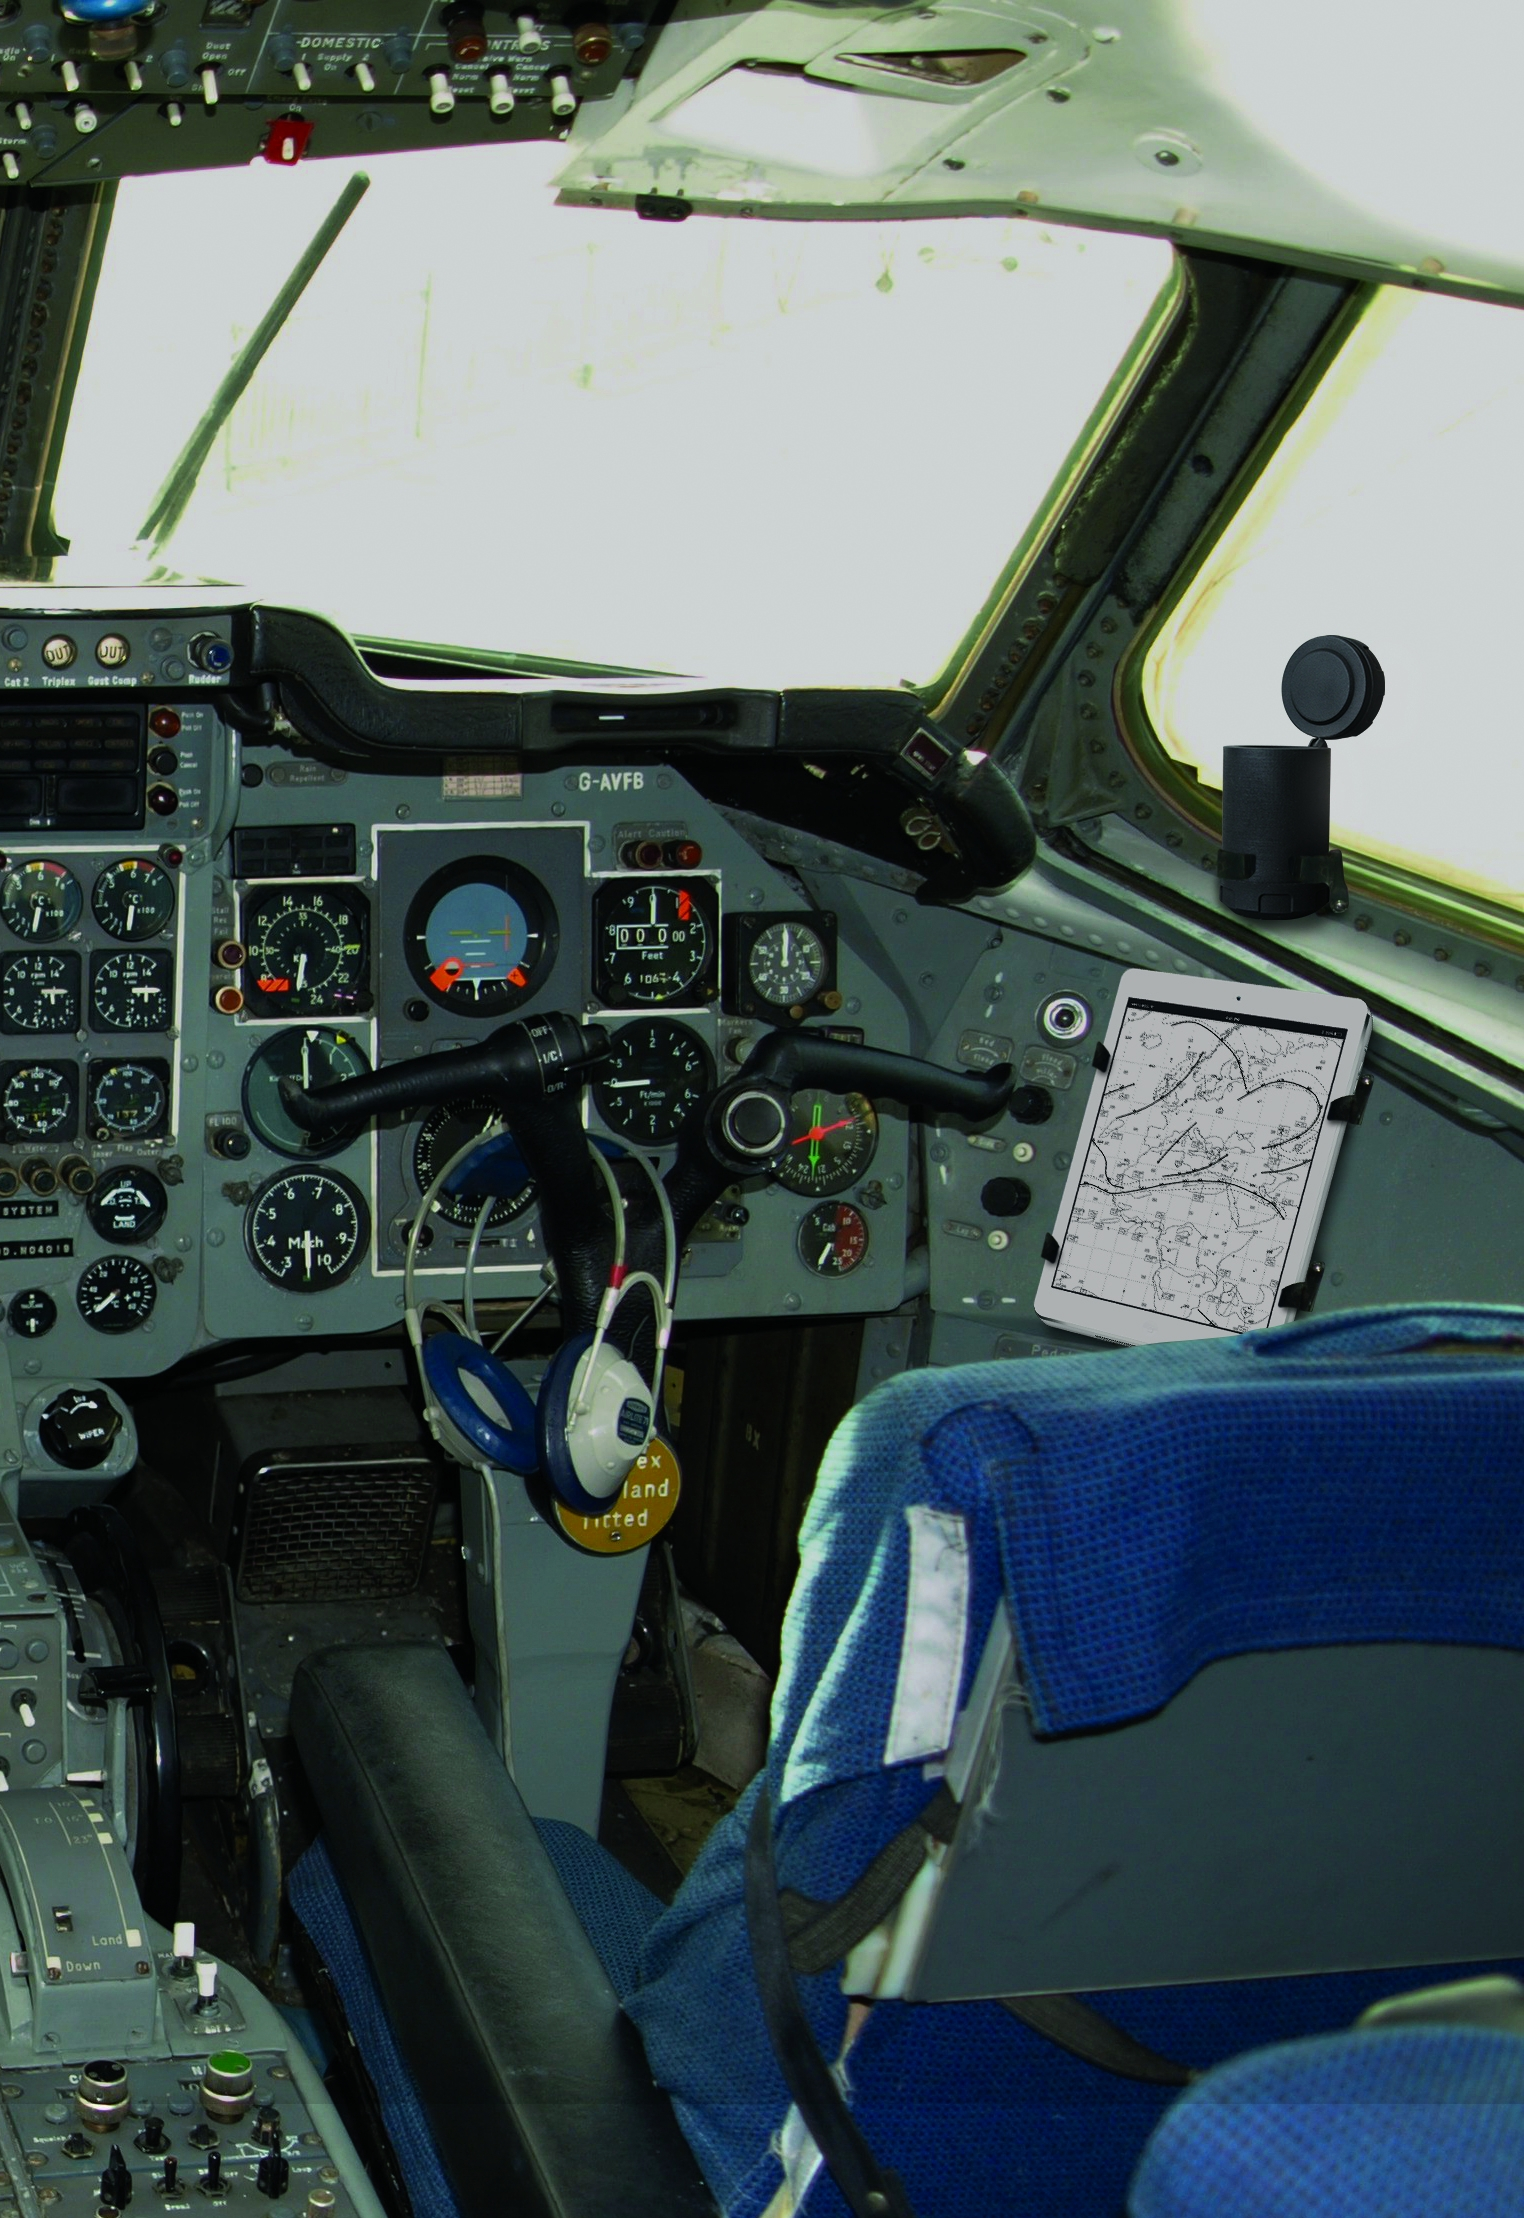 airmod_cockpit_zoom.jpg